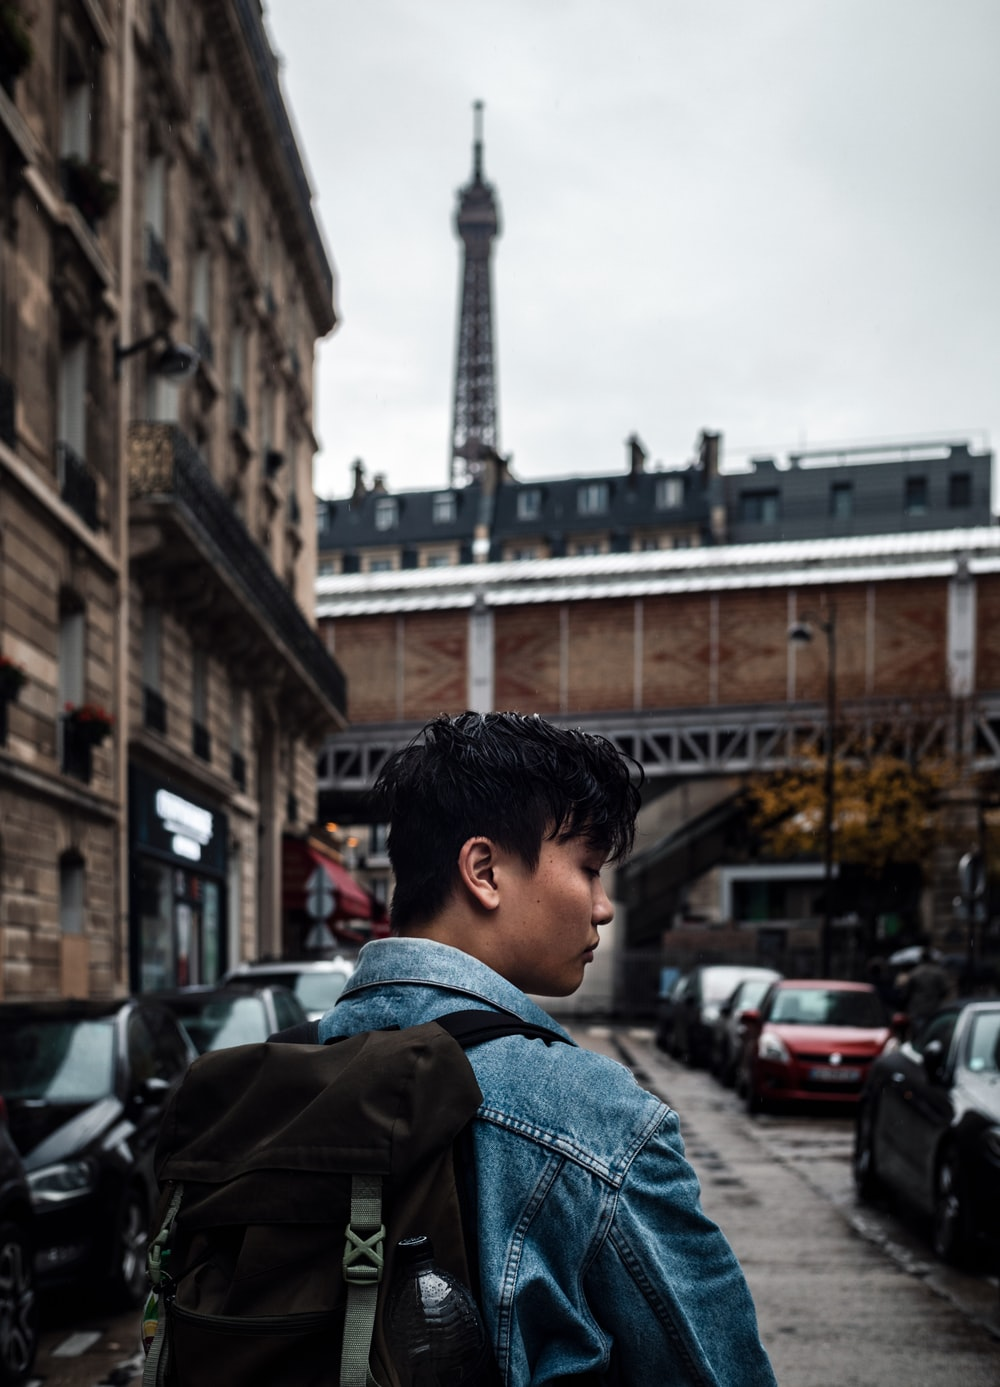 man wearing blue jacket near the building